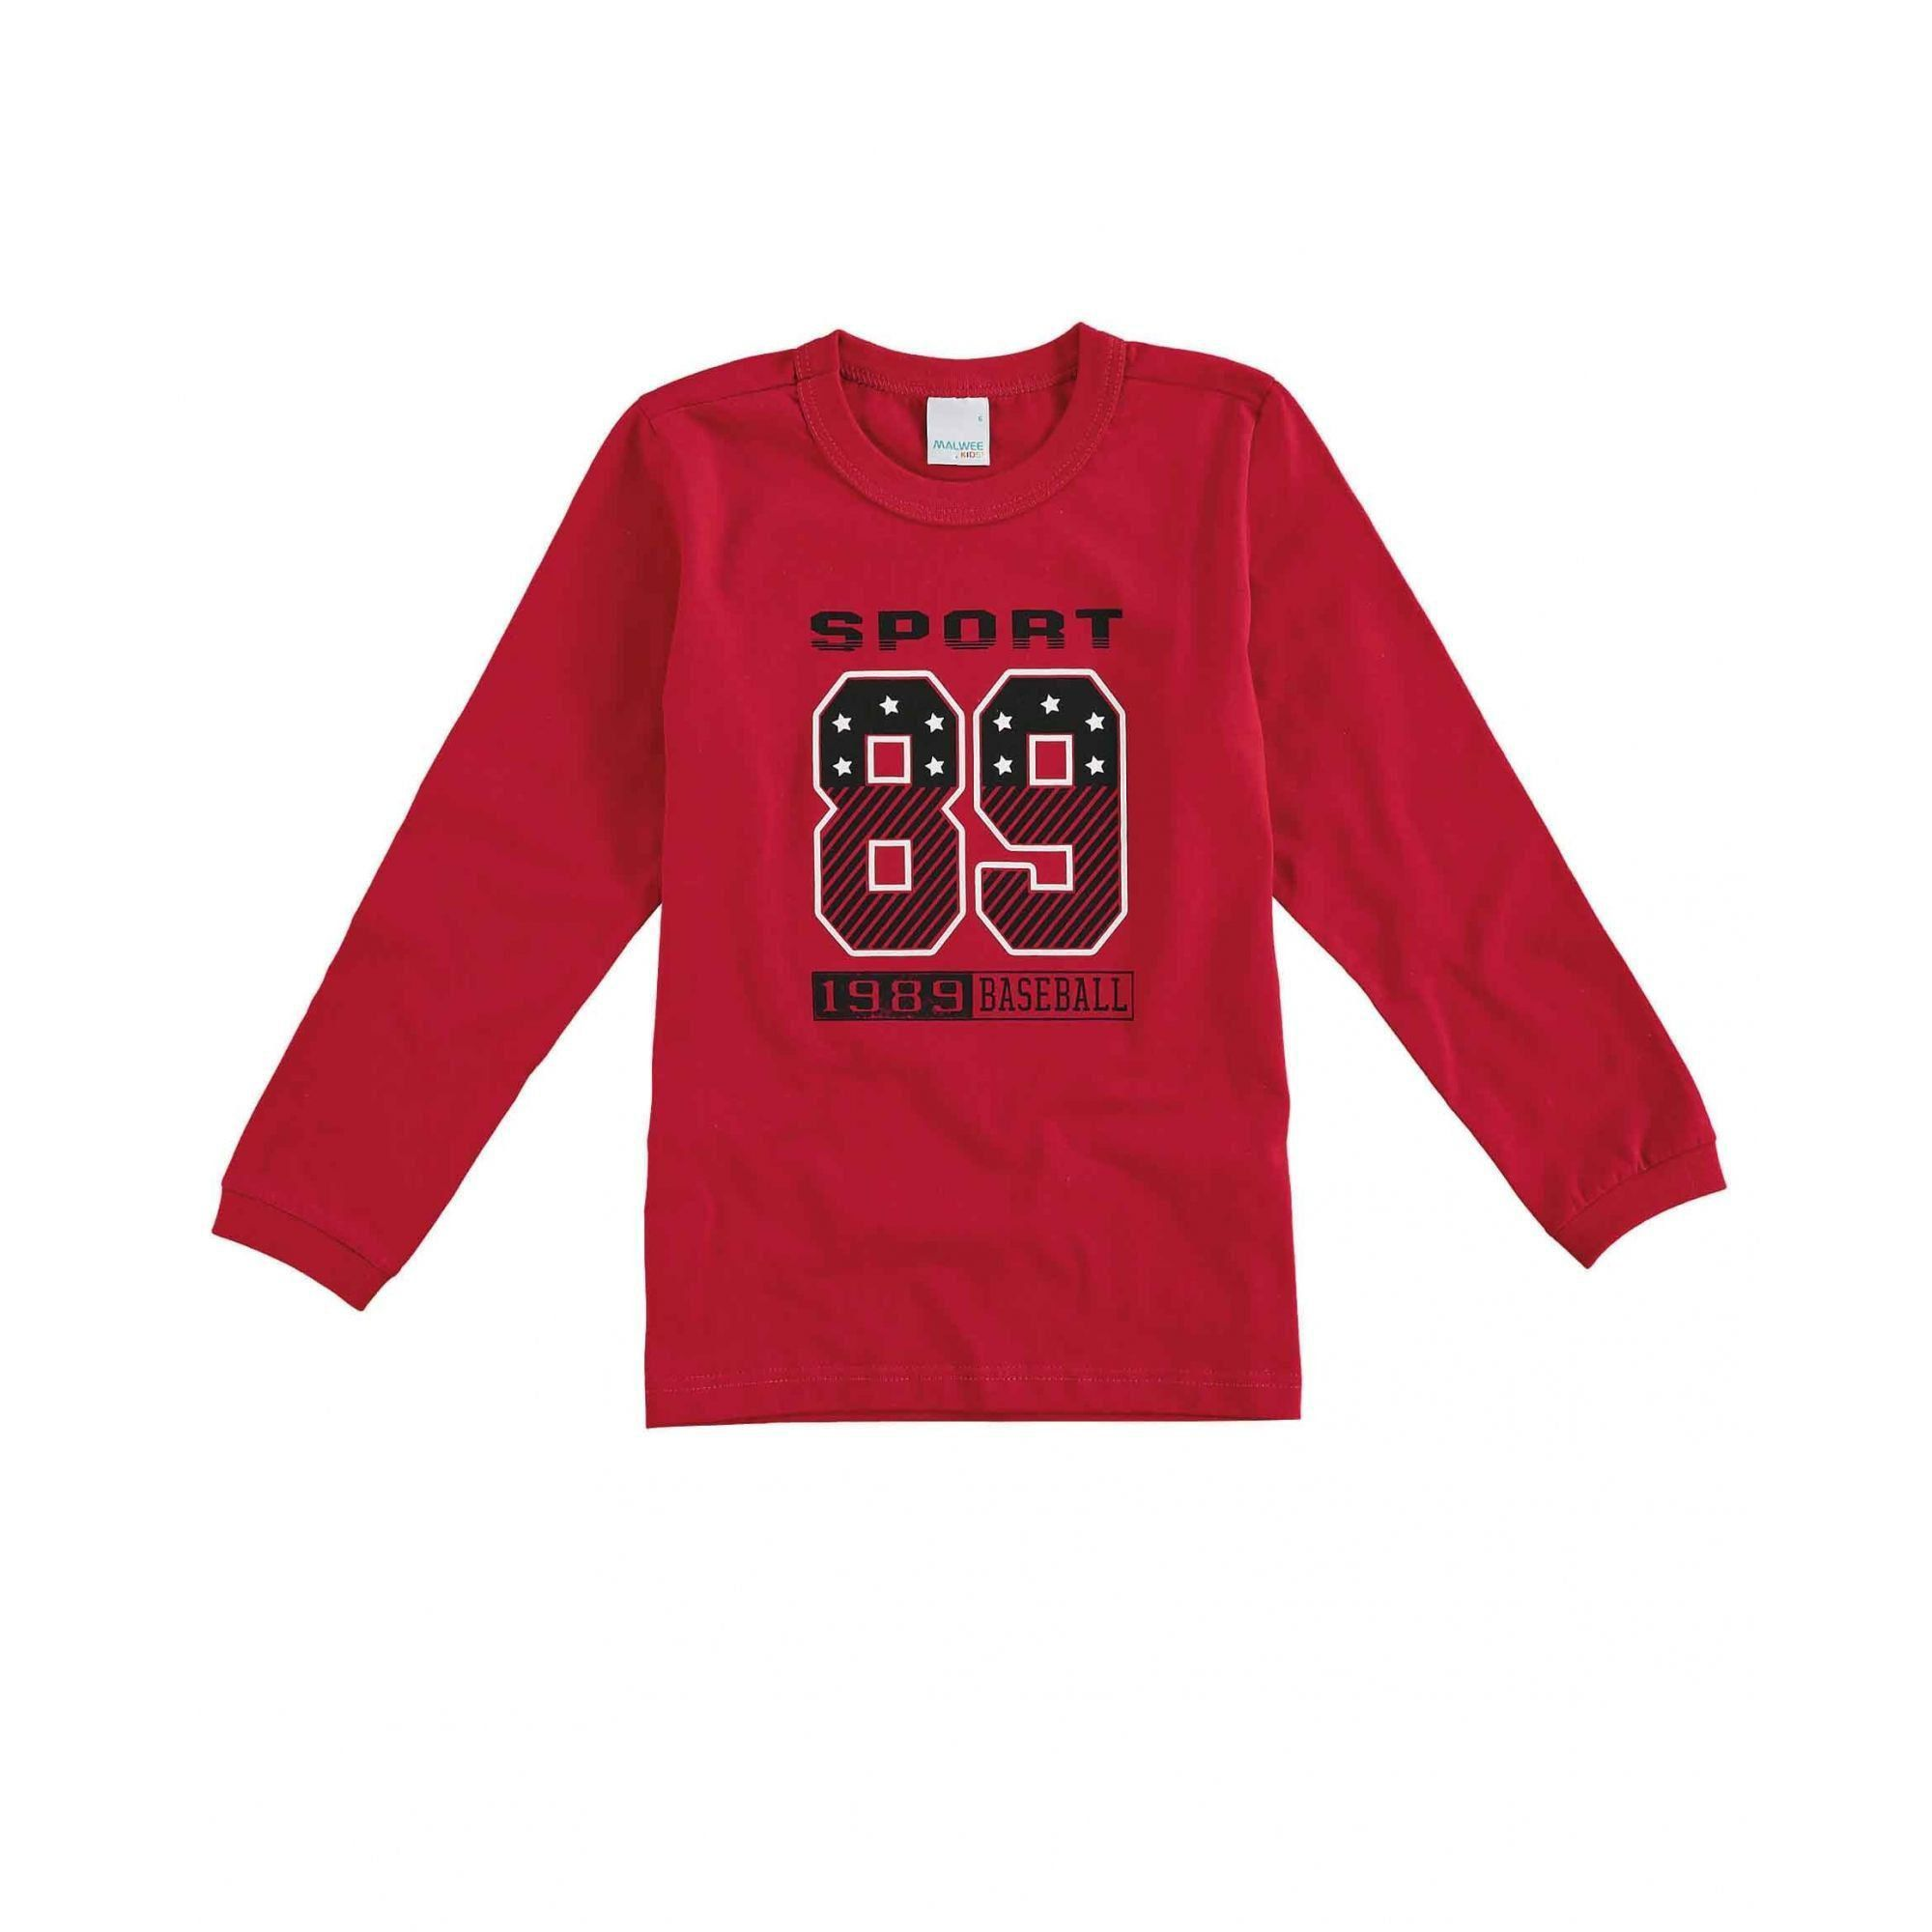 Camiseta Infantil Masculina Inverno Vermelha Sport Malwee